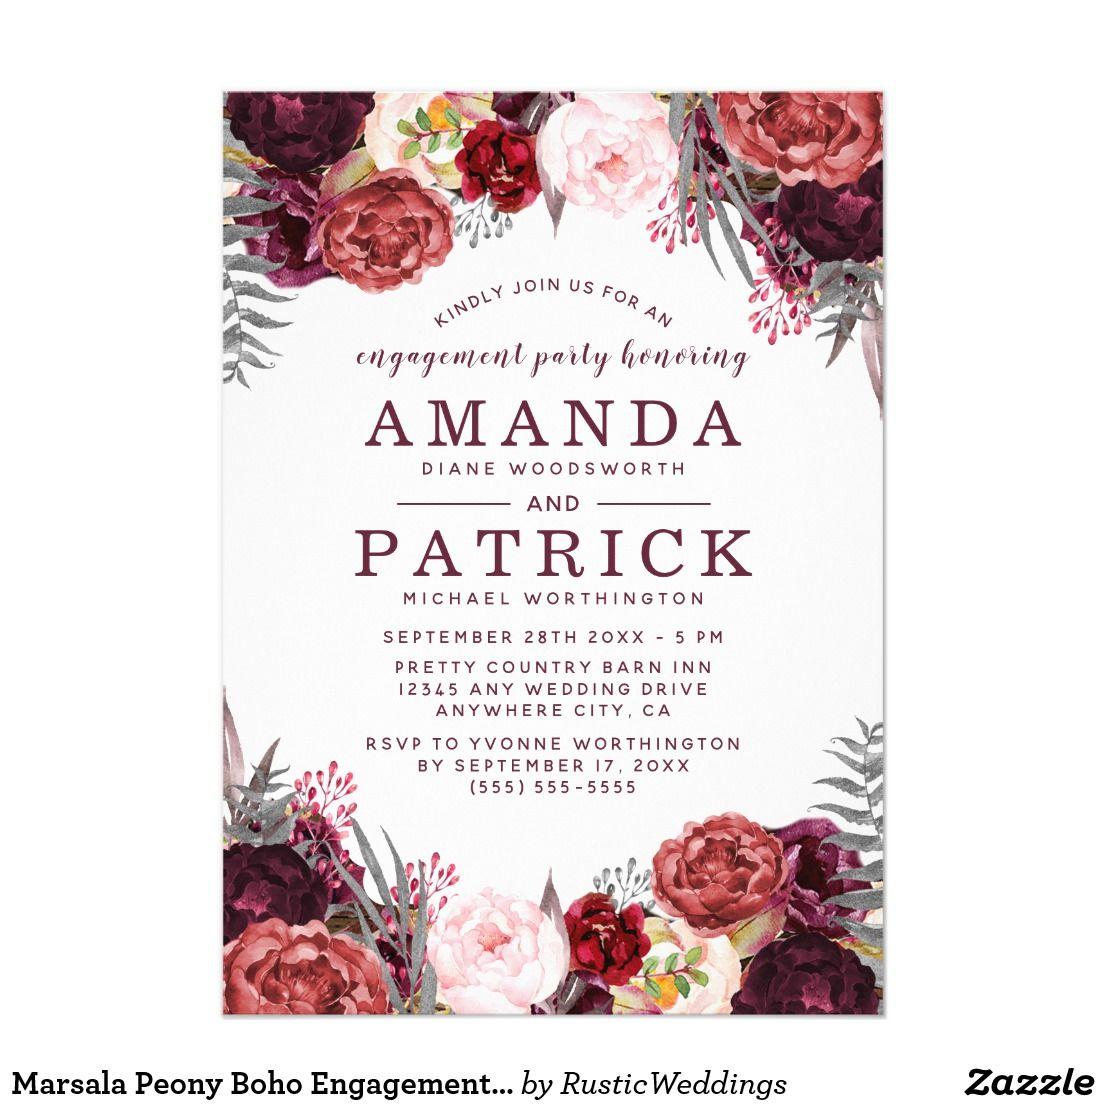 Marsala Peony Boho Engagement Party Invitations | Engagement party ...